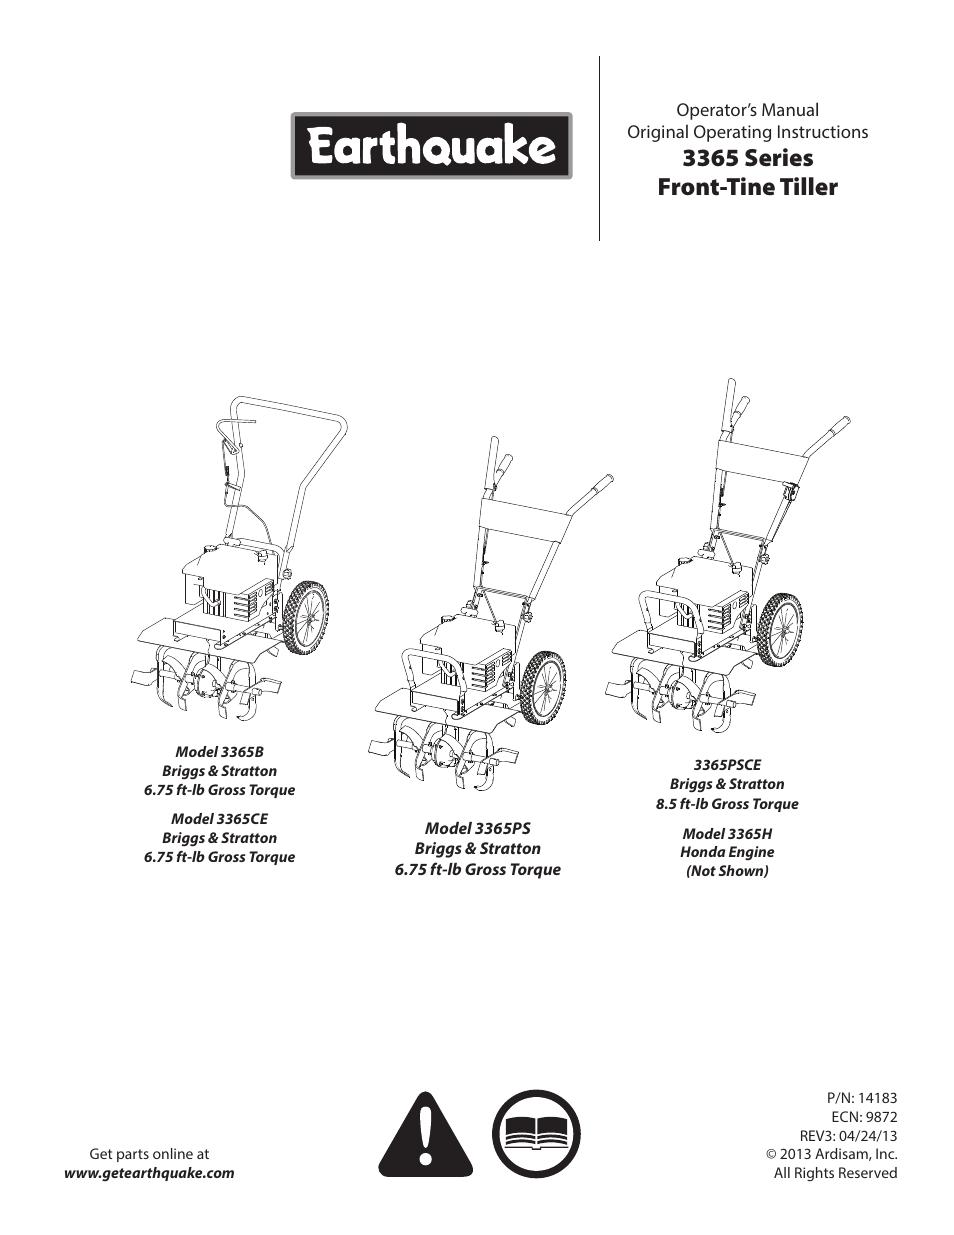 earthquake 3365ps user manual